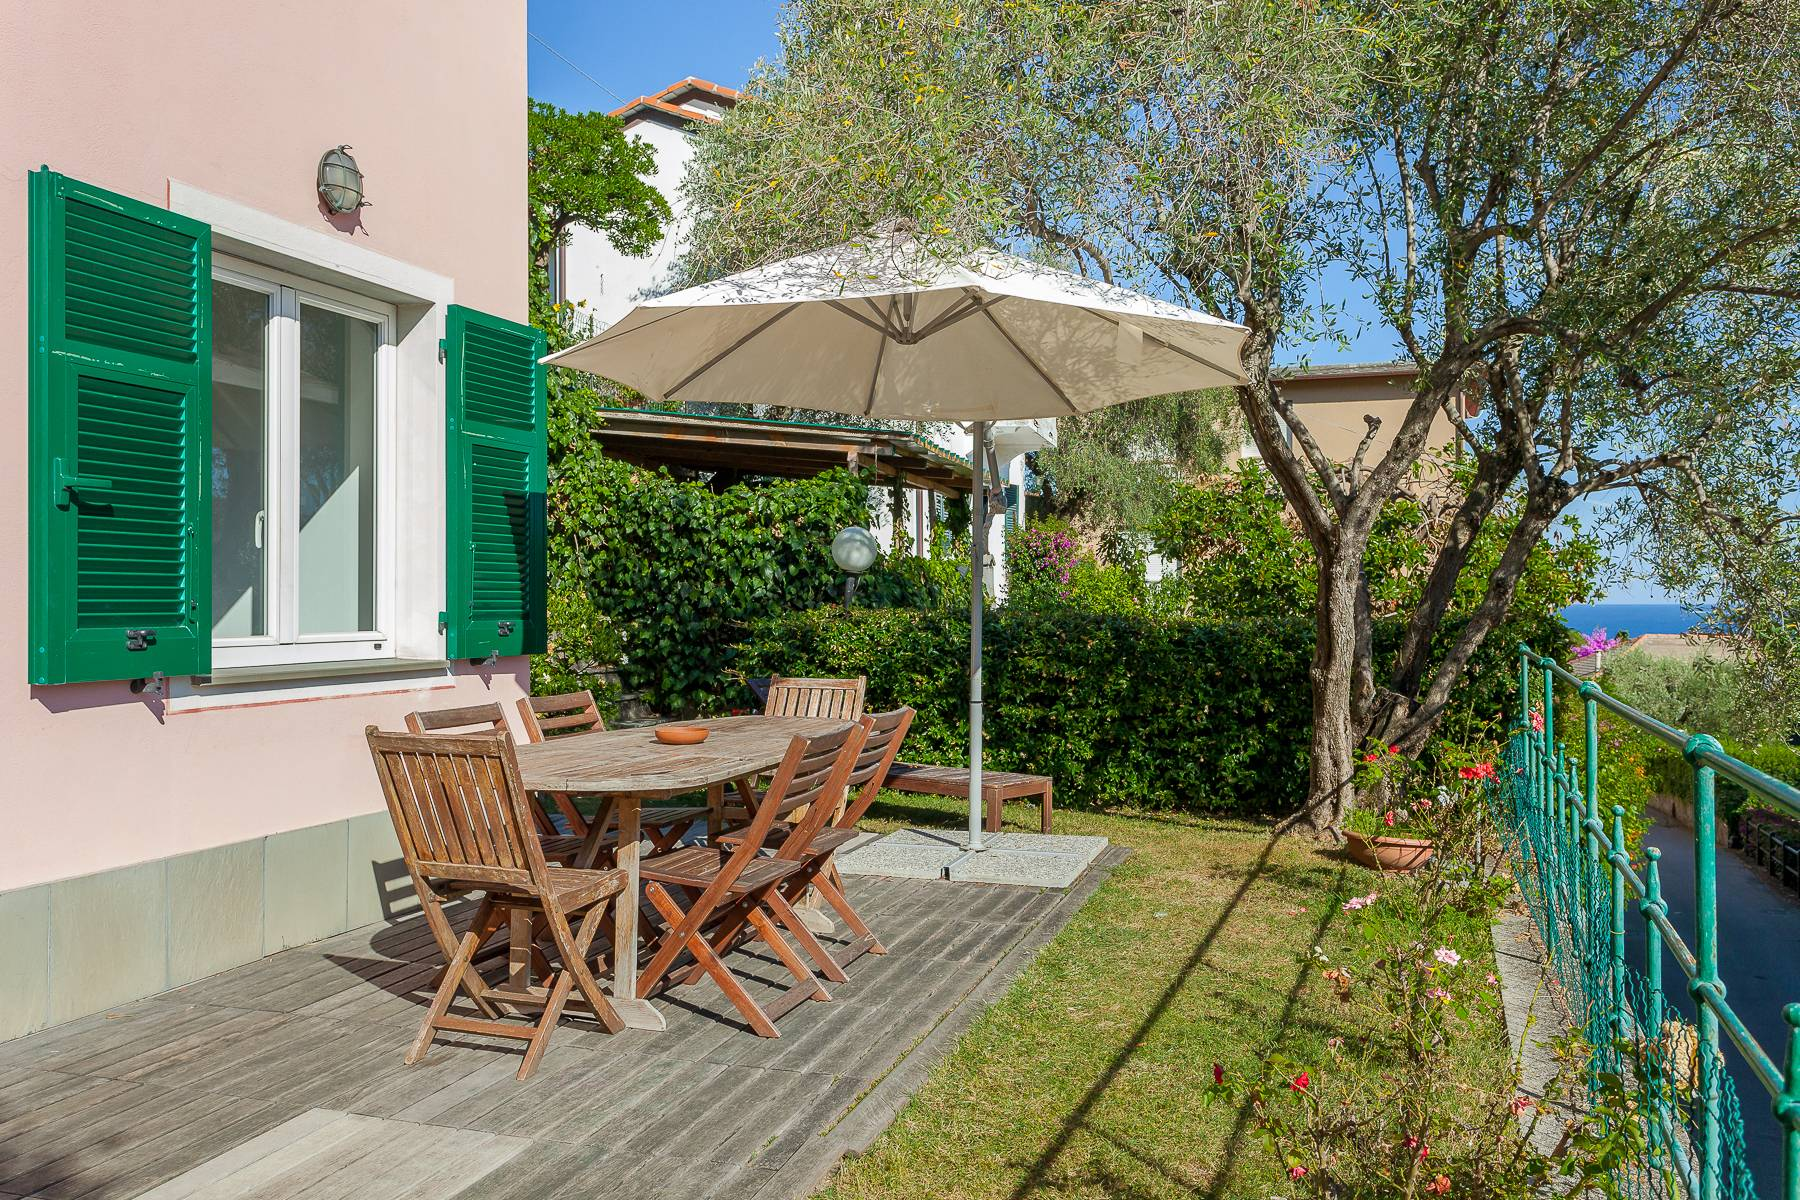 Casa indipendente in Vendita a Zoagli: 5 locali, 100 mq - Foto 13